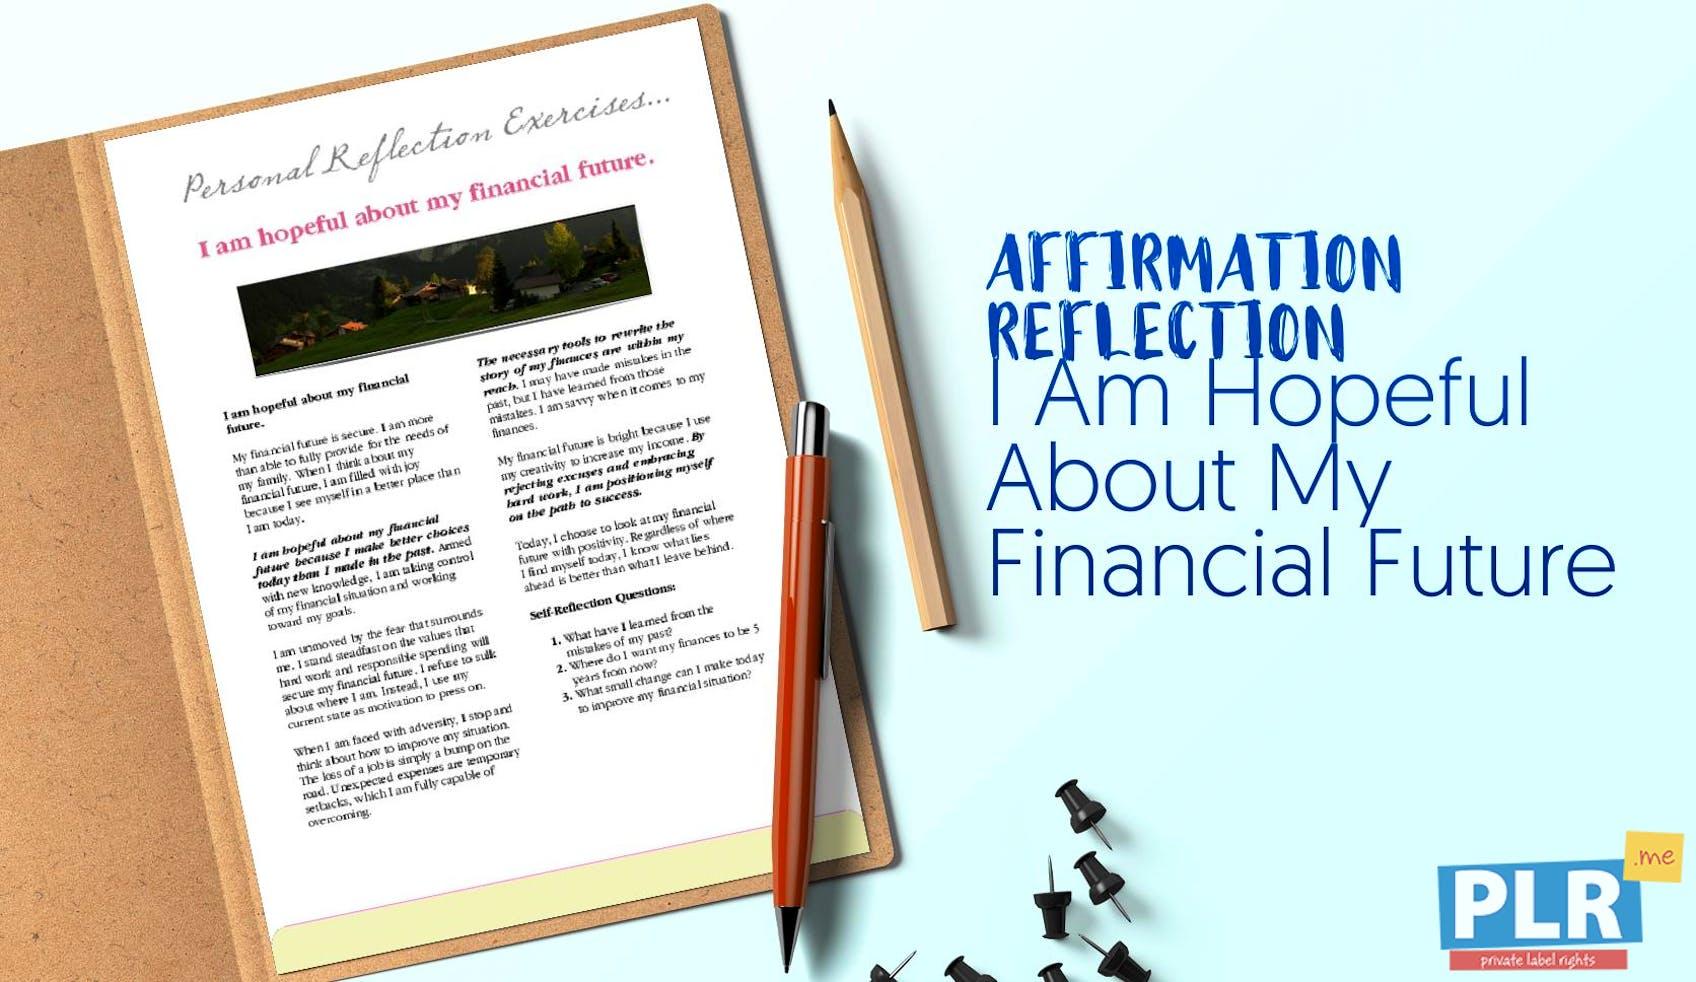 I Am Hopeful About My Financial Future